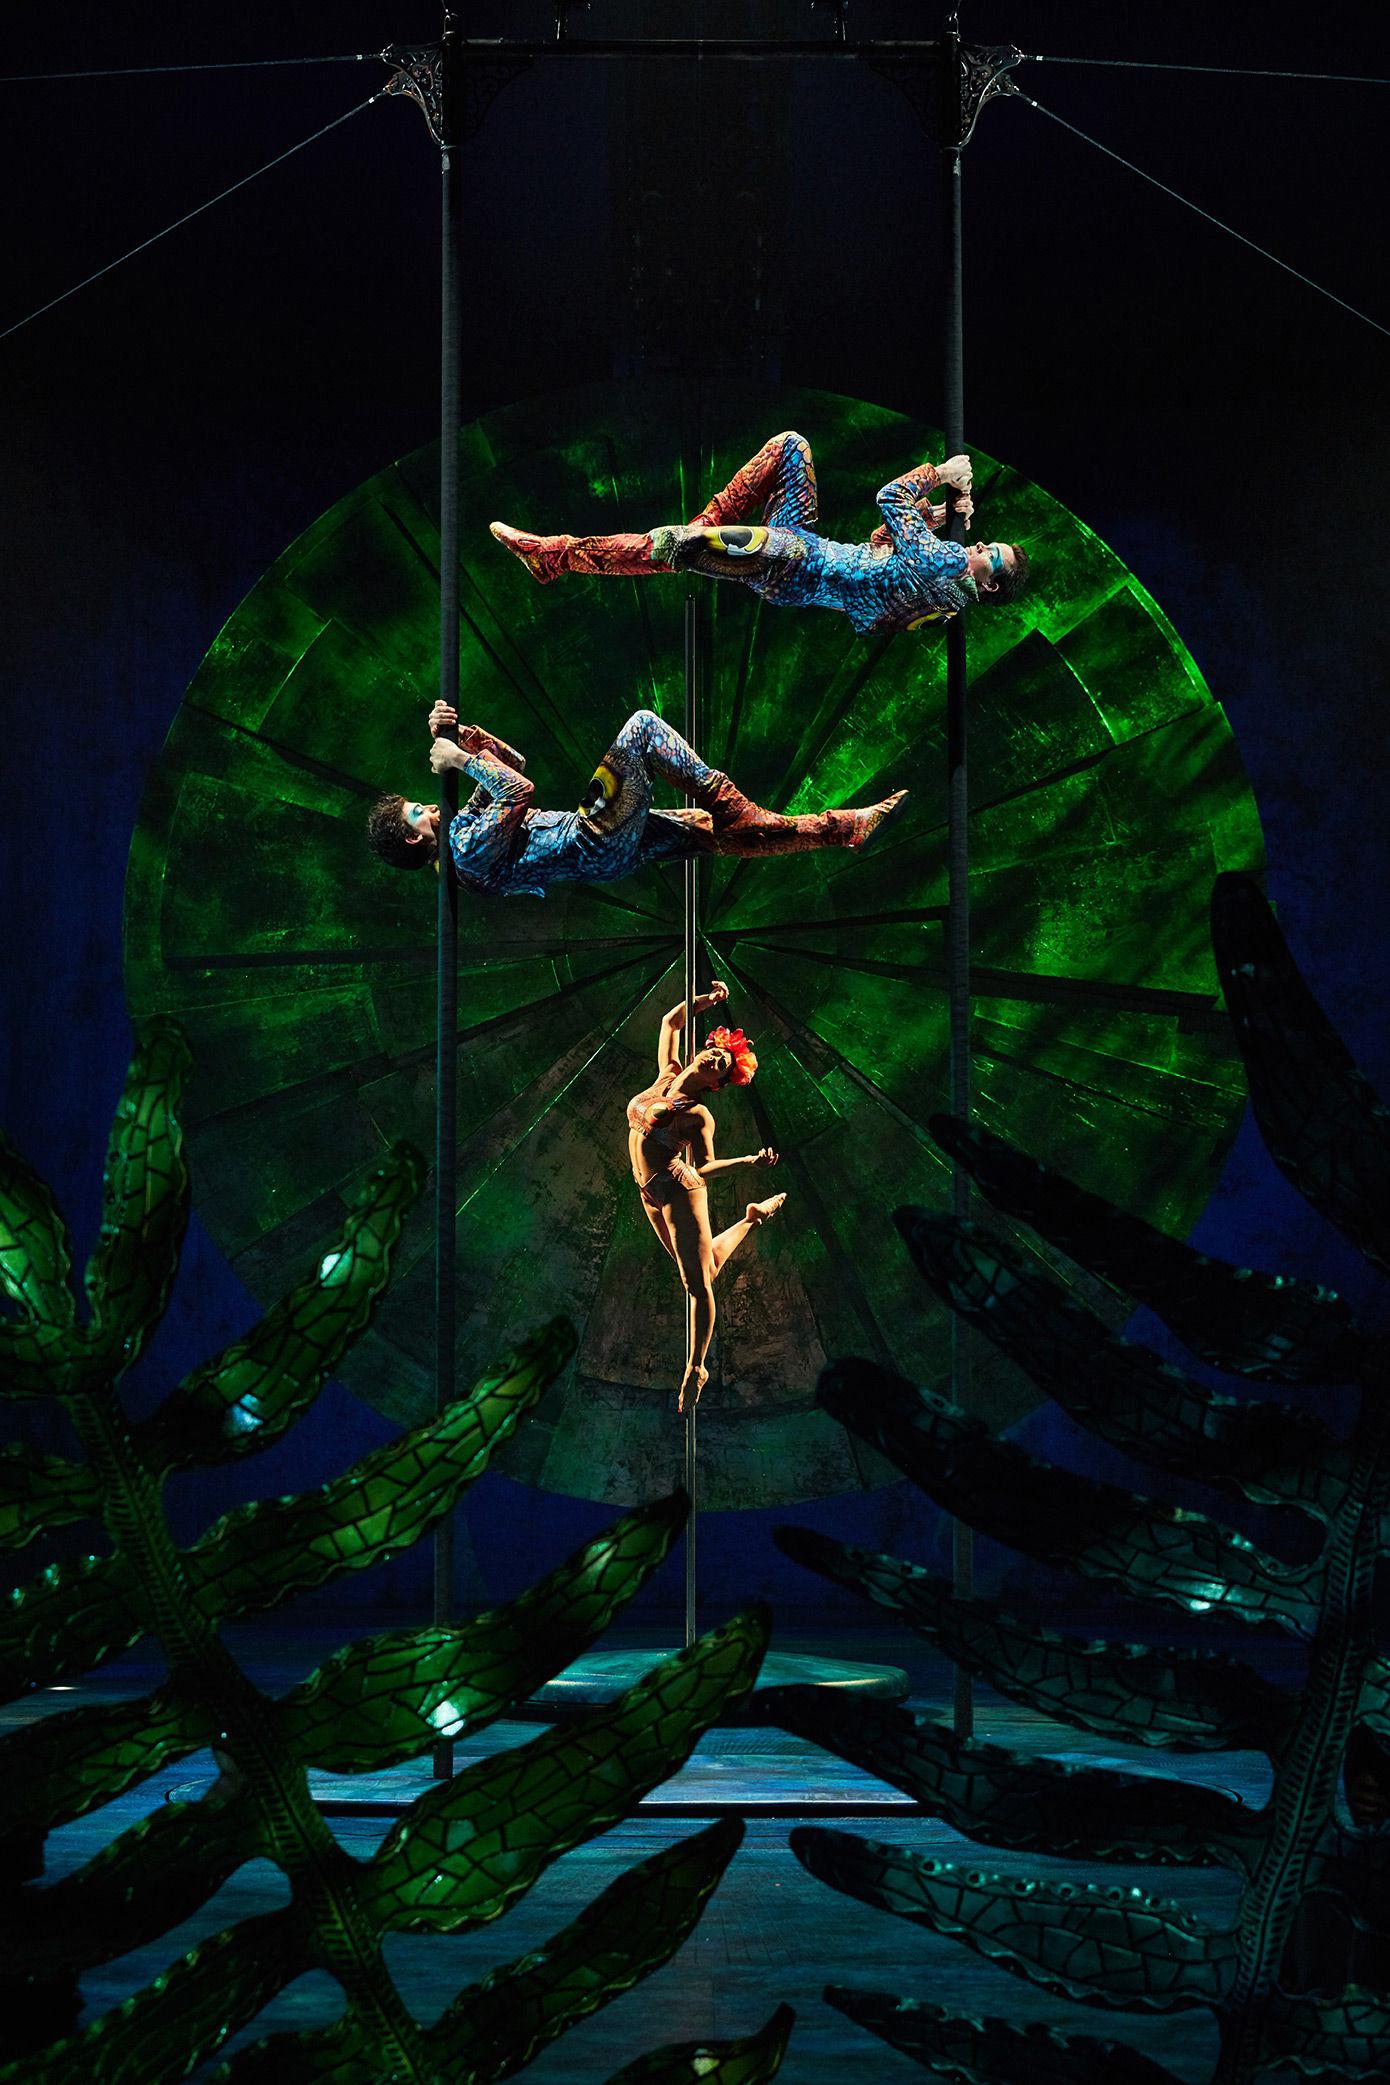 Cirque Du Soleil Pole Act